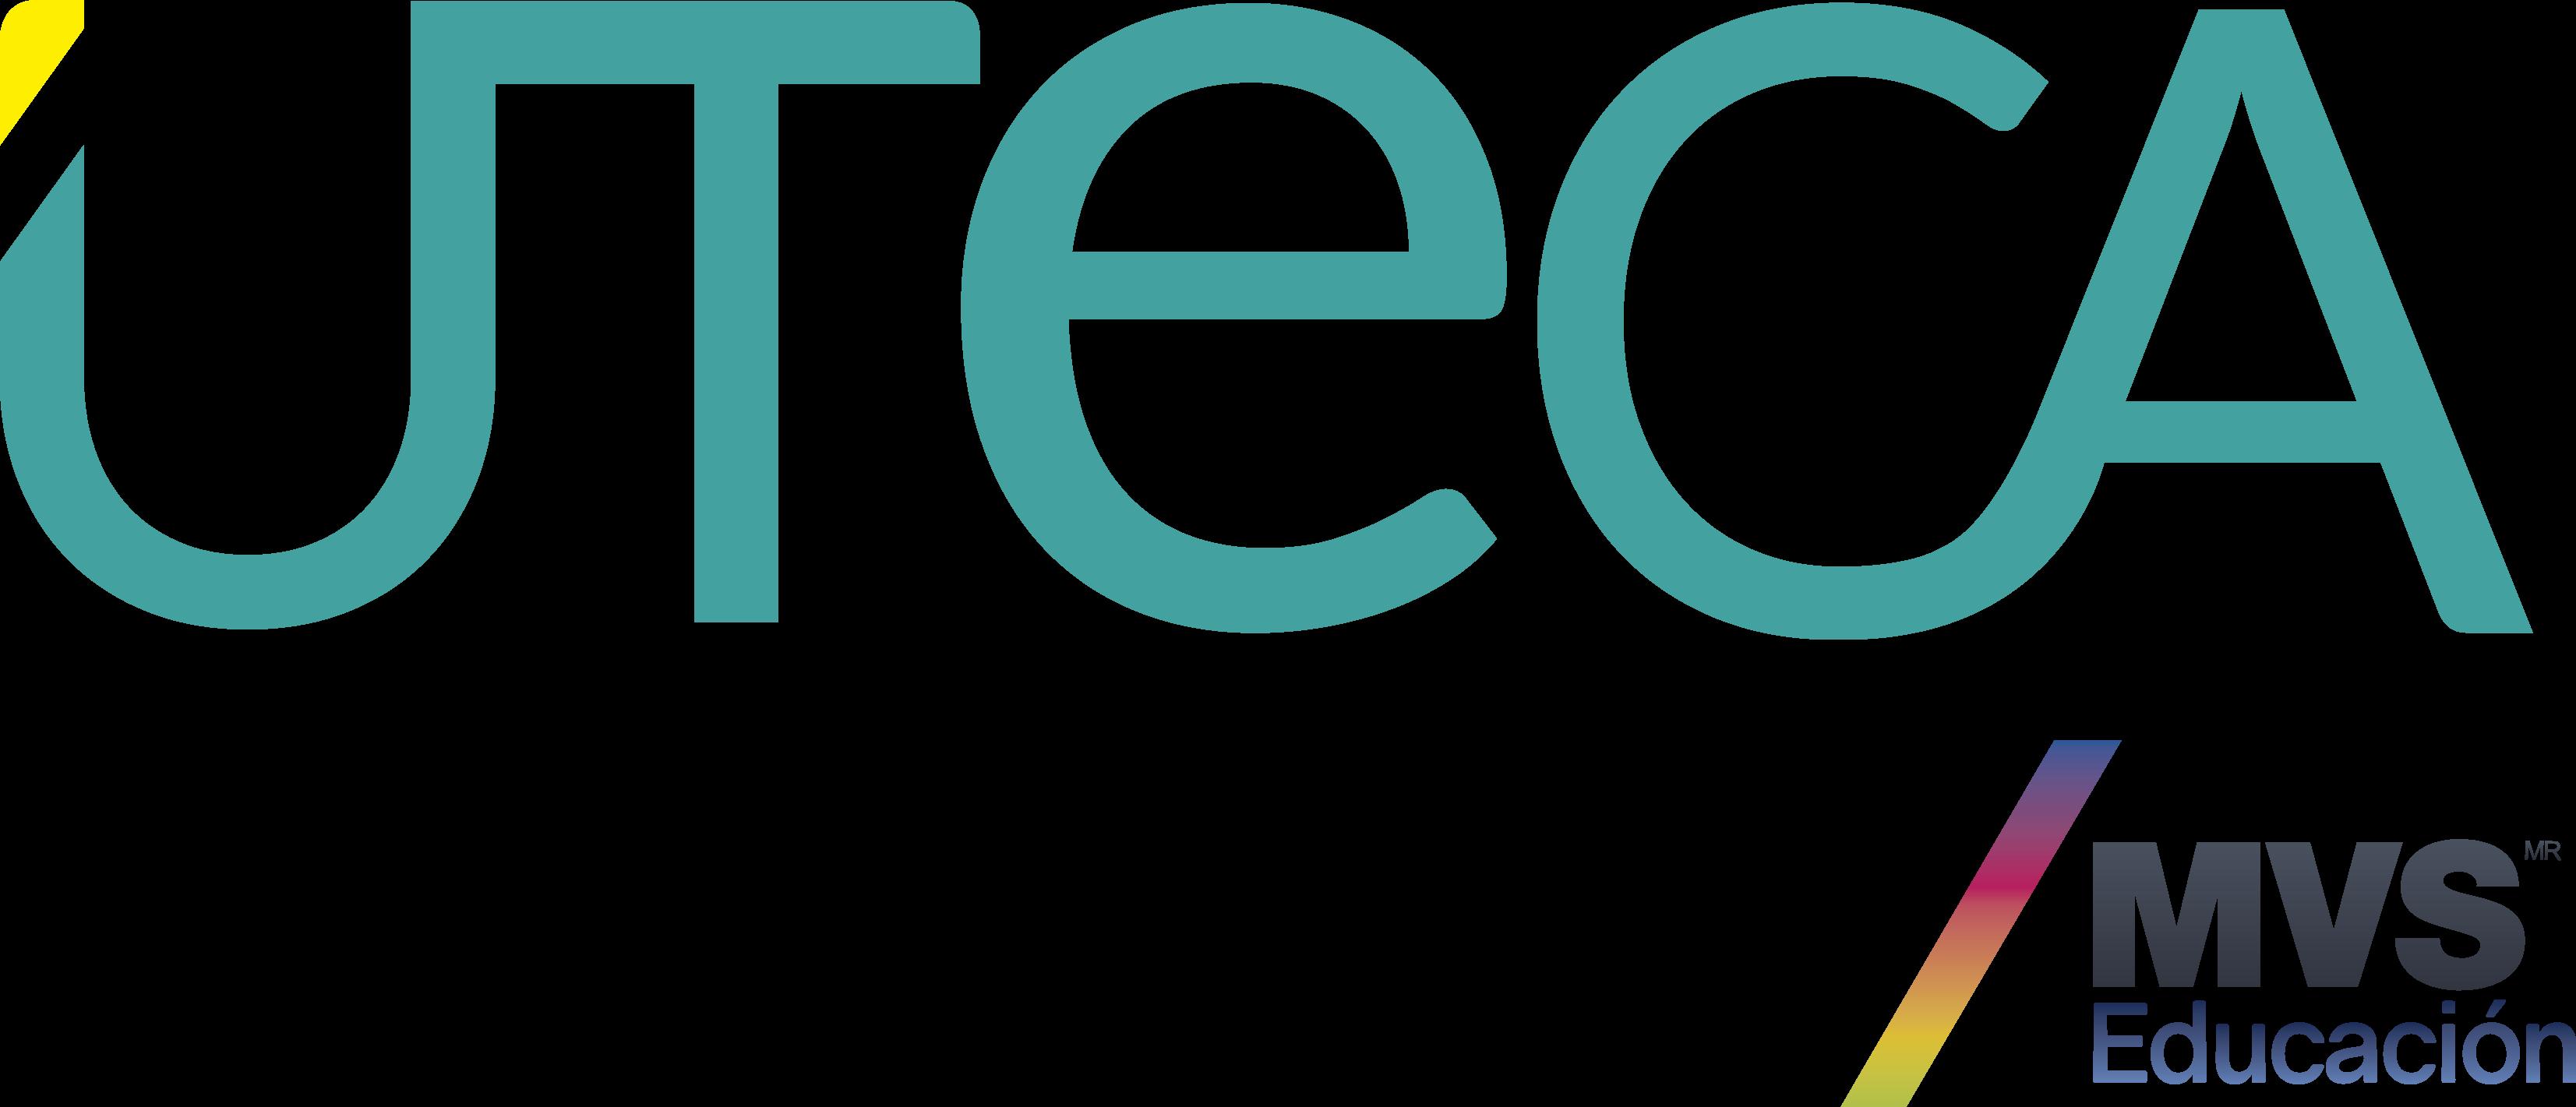 Universidad Tecnológica Americana (UTECA)